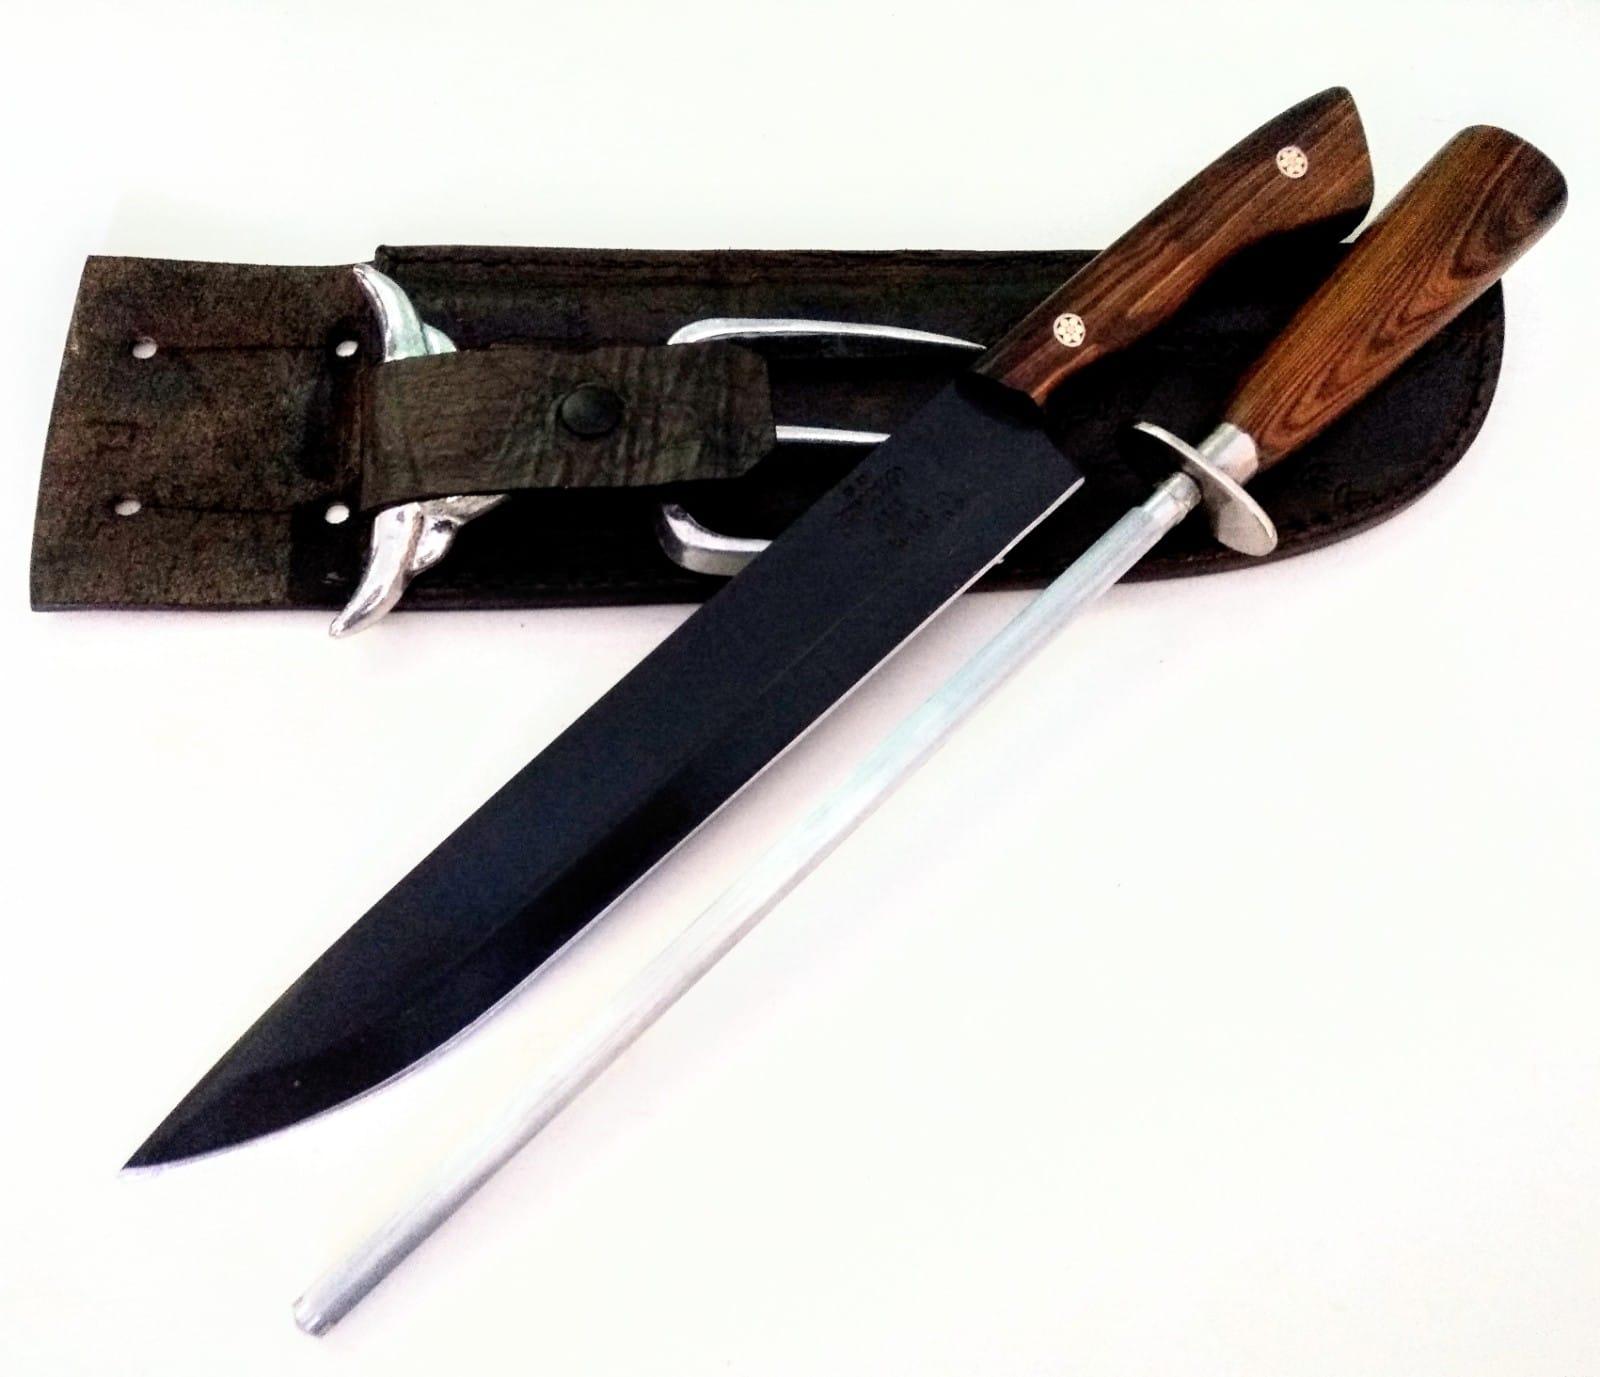 Kit churrasco artesanal faca chaira e garfo trinchante